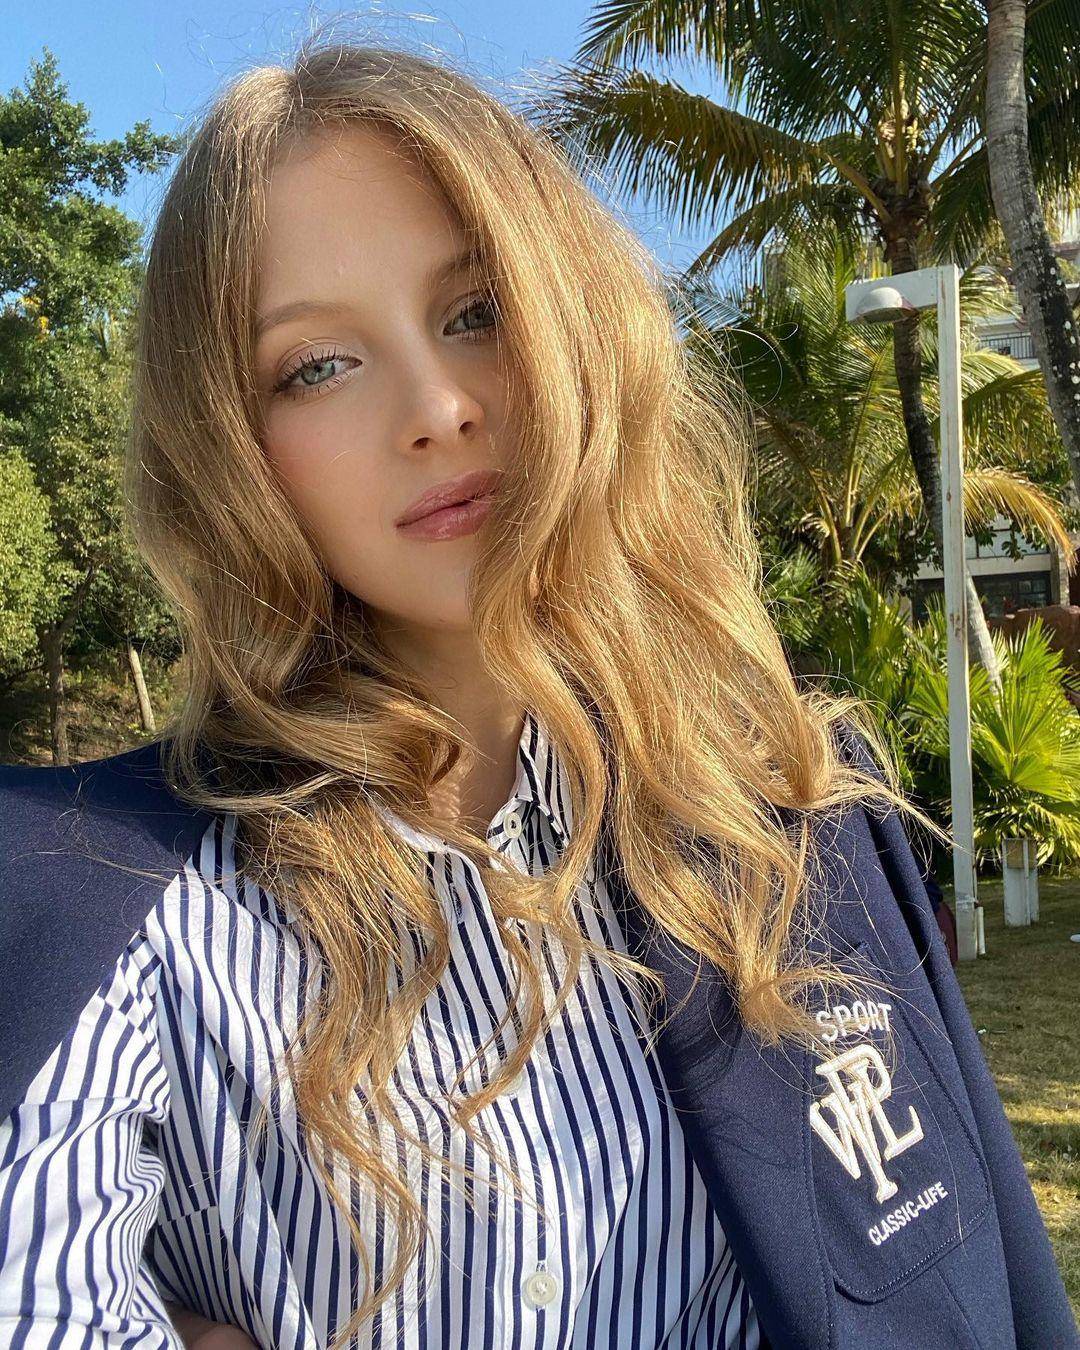 Nicole-marie-j-Wallpapers-Insta-Fit-Bio-10